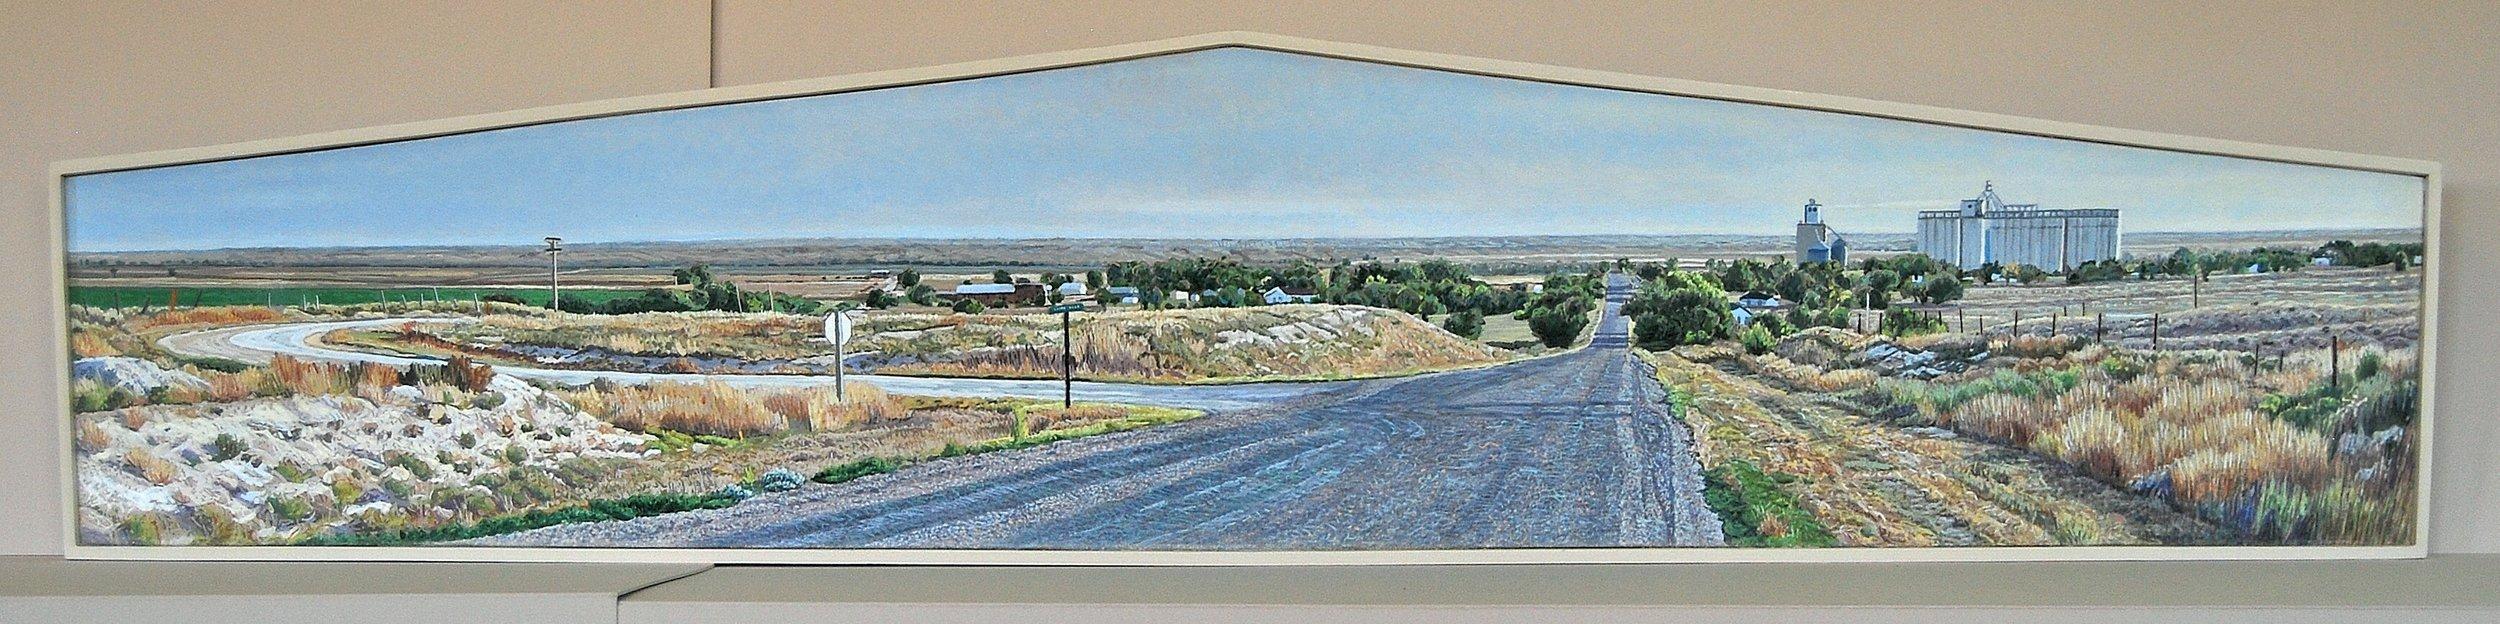 "Lloyd Brown, ""Kendall, Kansas, US Highway 50,"""